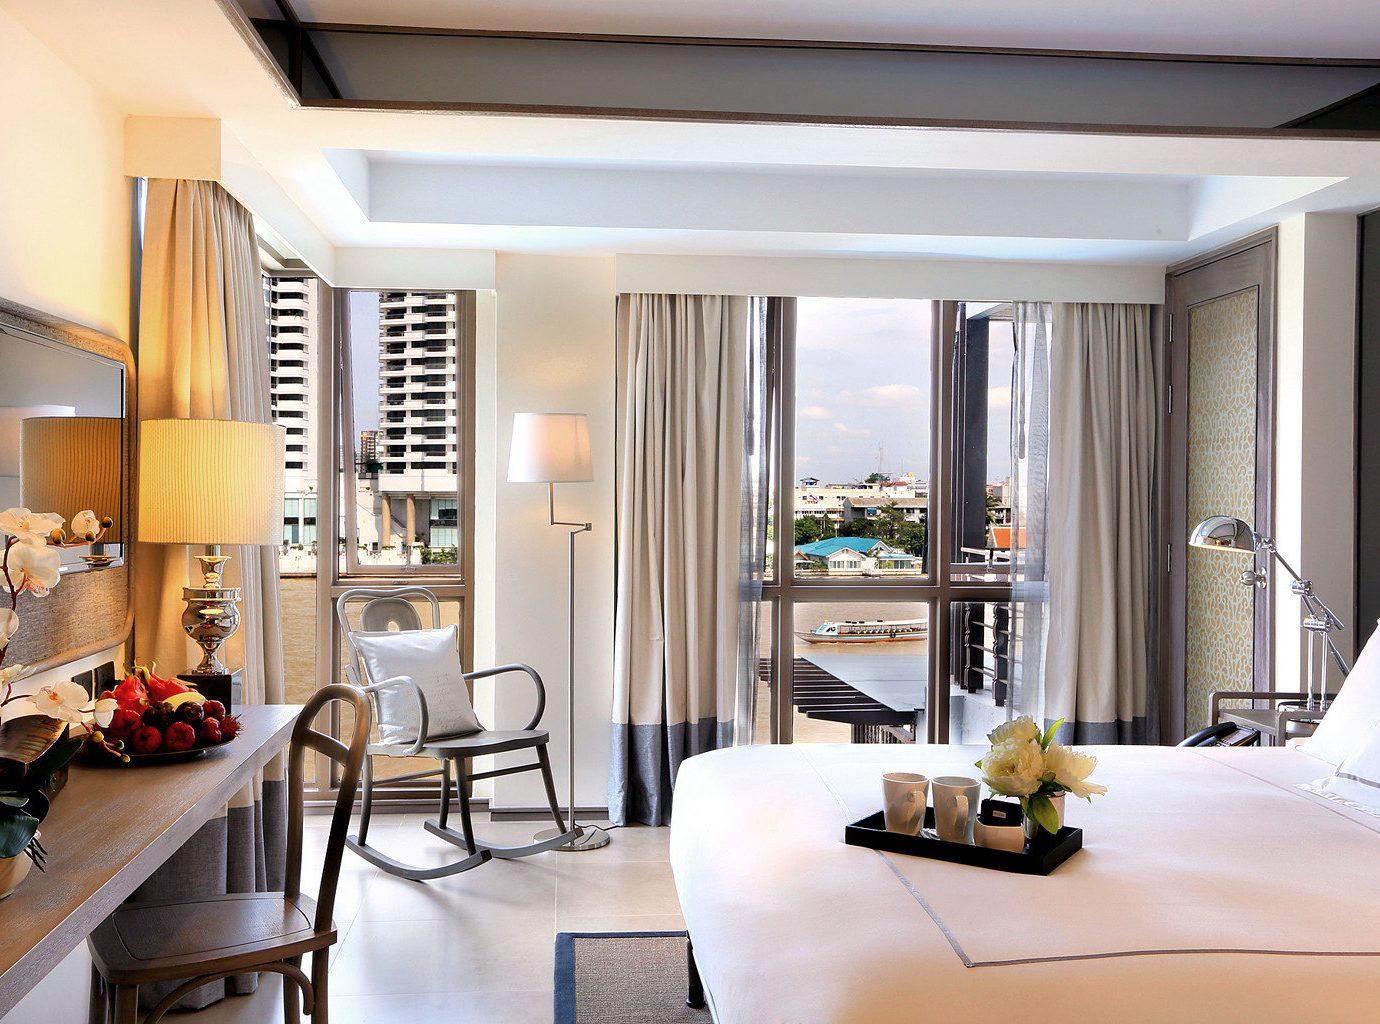 Bedroom Hotels Modern Scenic views Suite property living room condominium home Villa